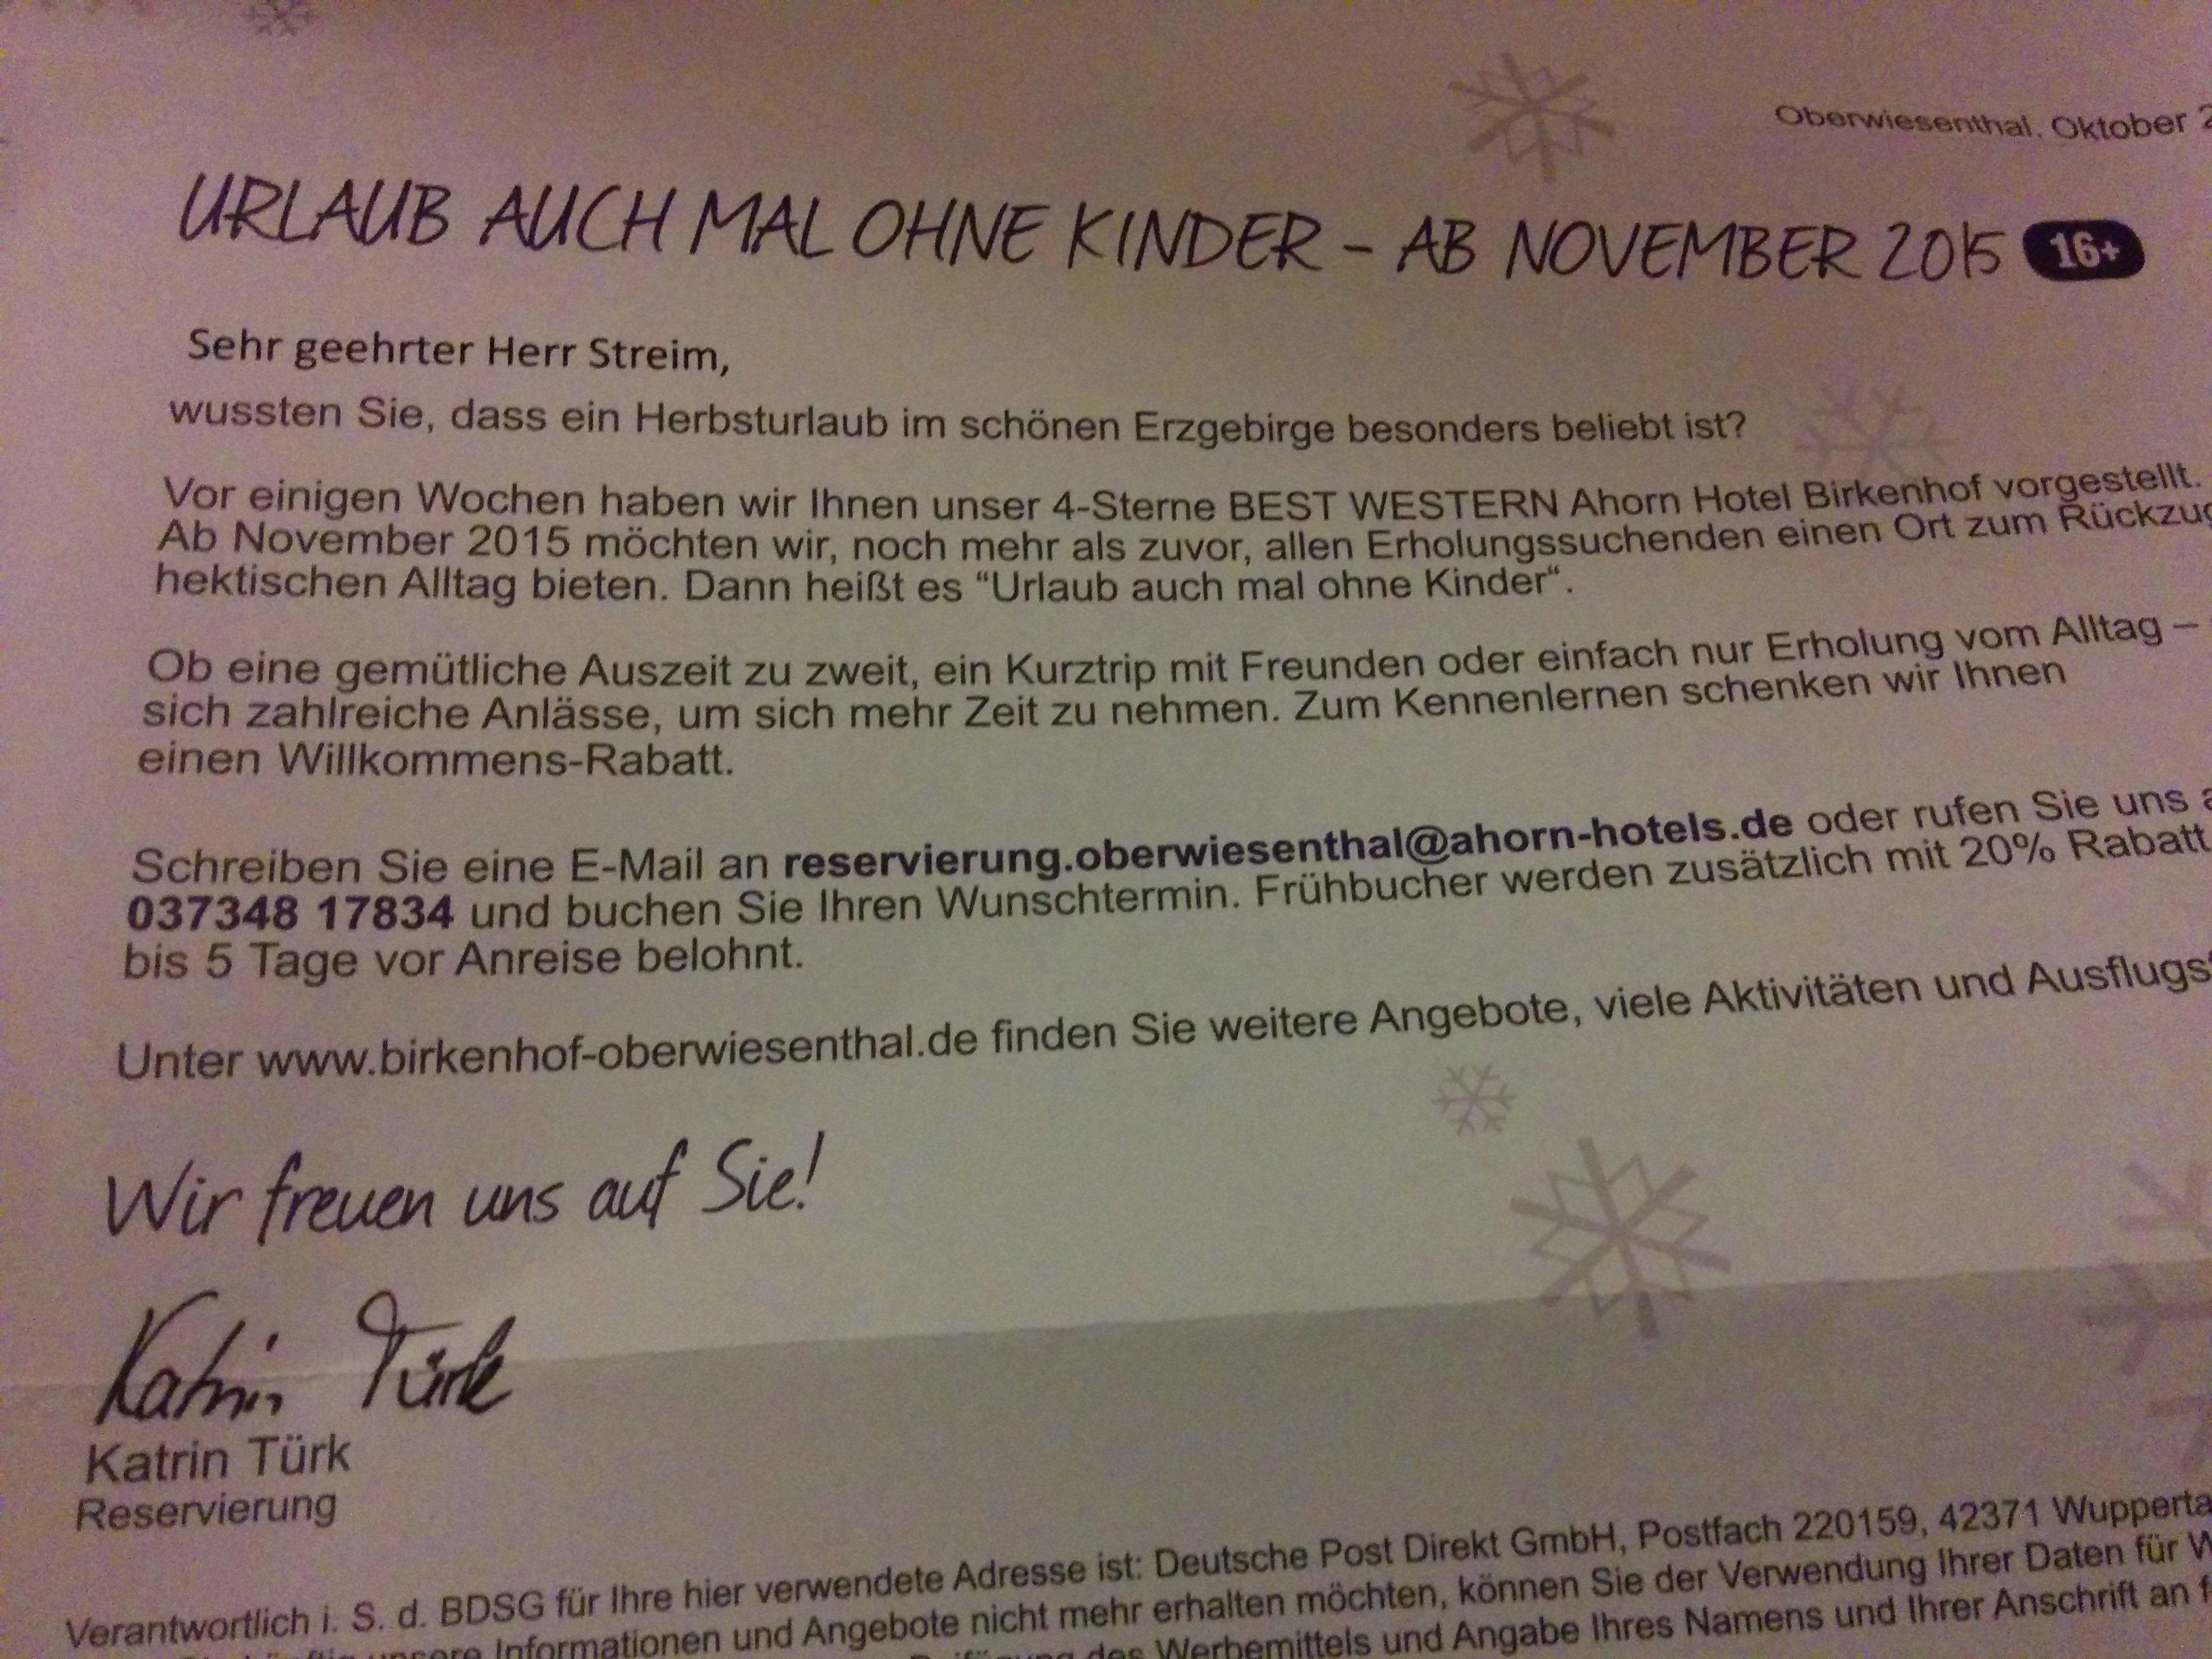 Urlaub Auch Mal Ohne Ahorn Hotel Andreas Streim